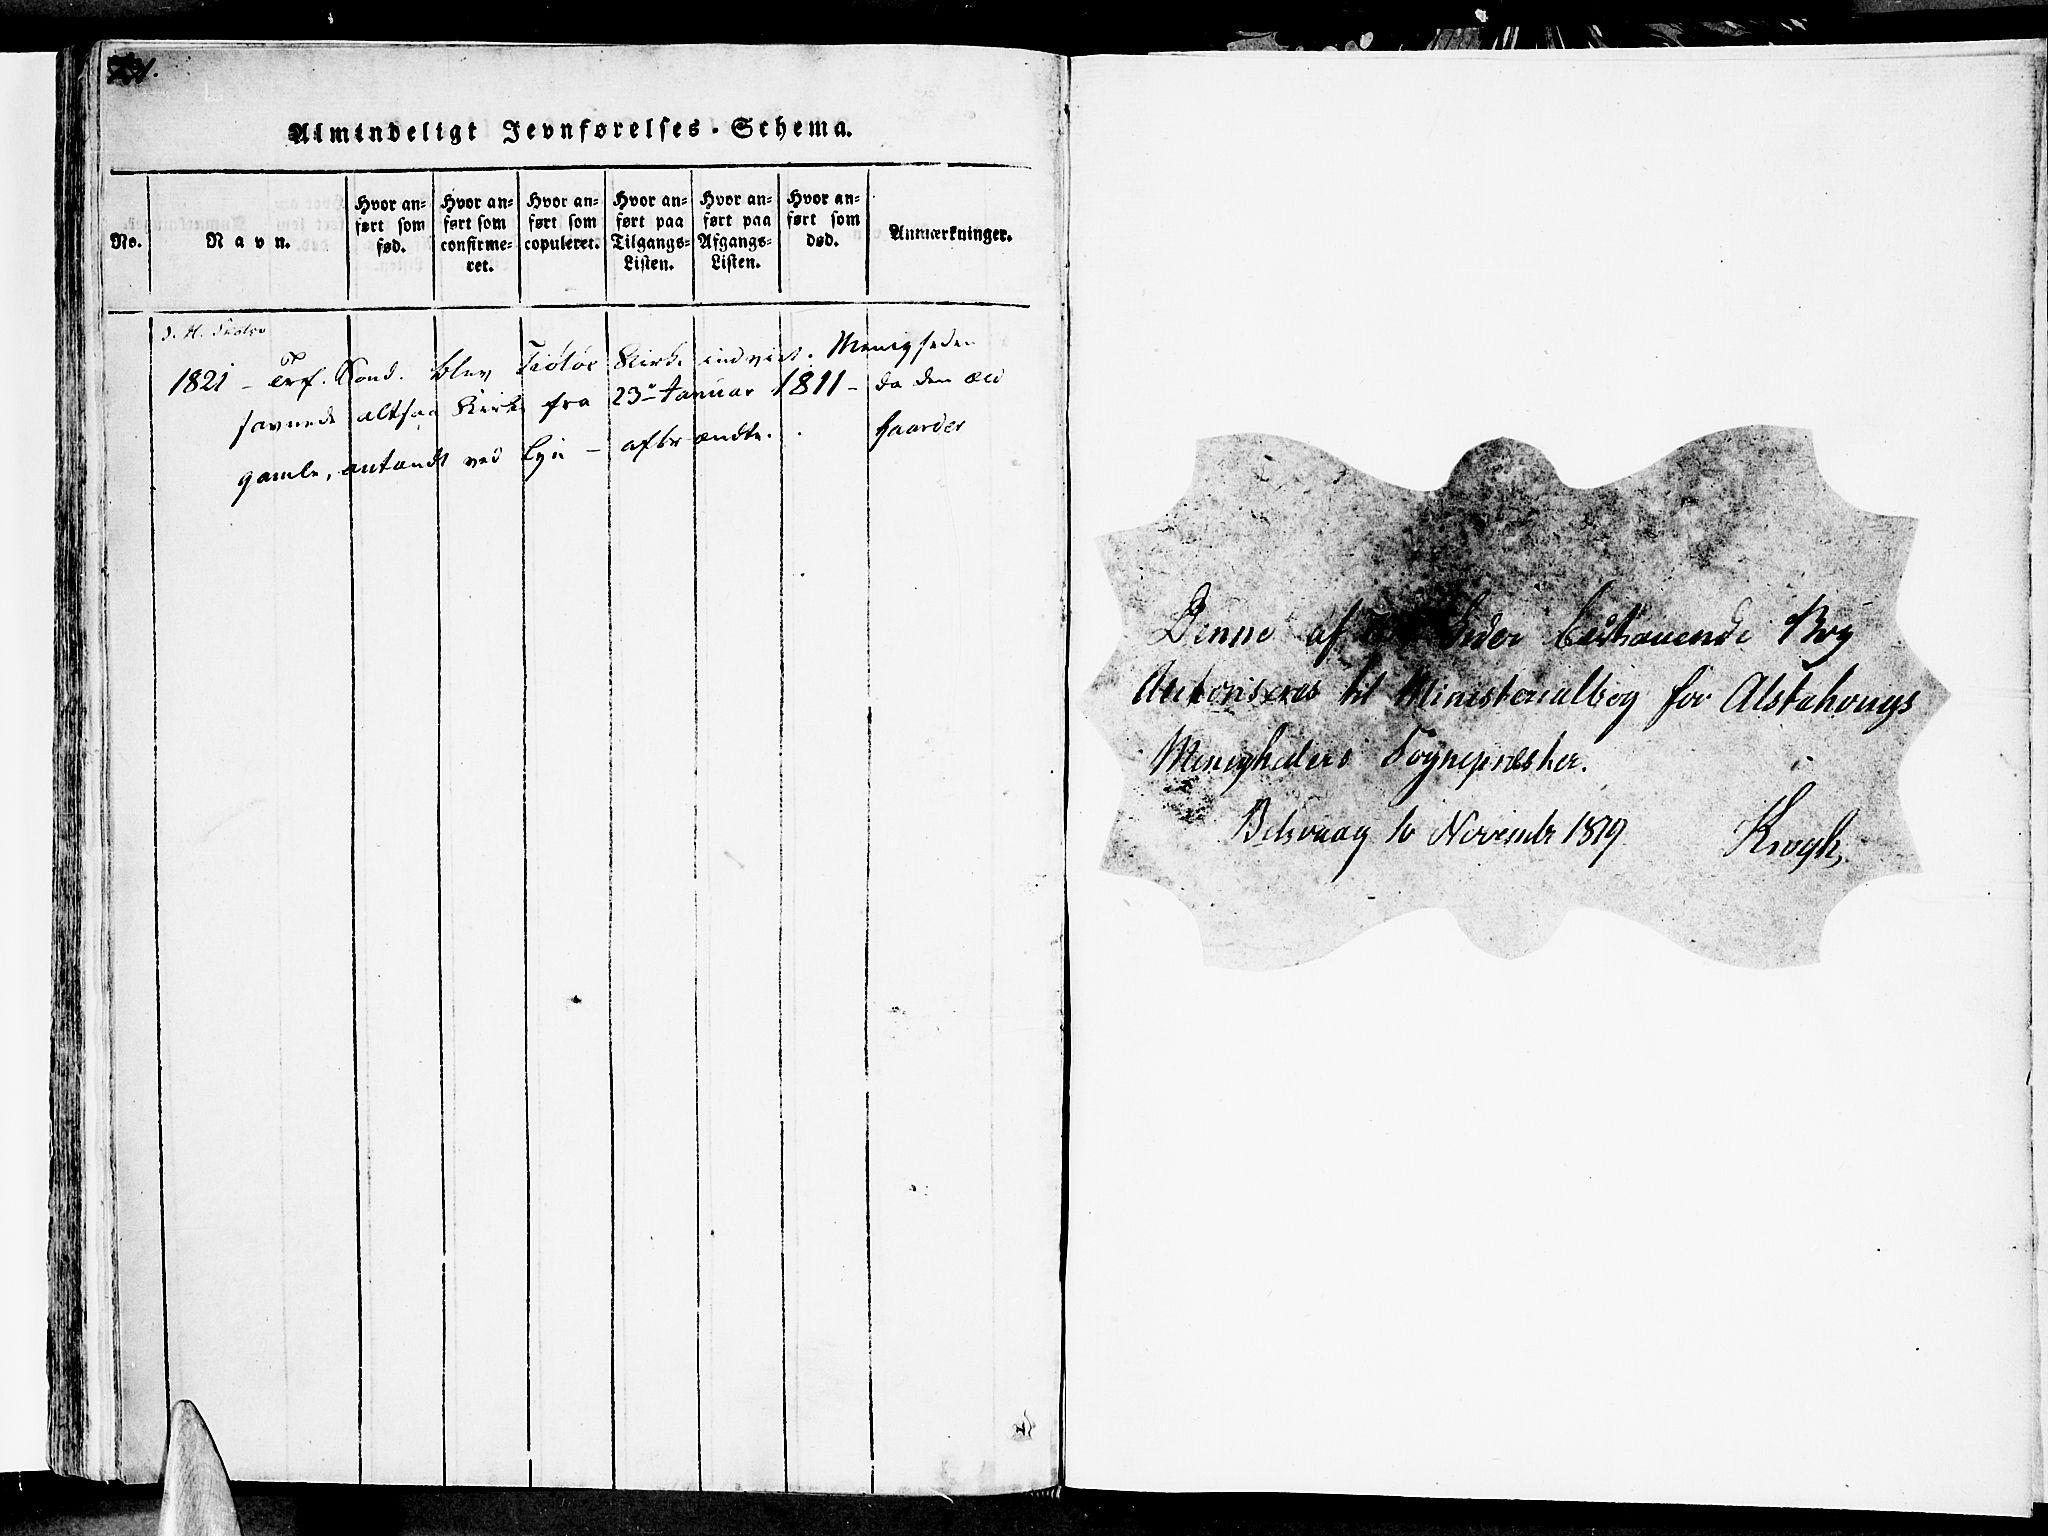 SAT, Ministerialprotokoller, klokkerbøker og fødselsregistre - Nordland, 830/L0445: Ministerialbok nr. 830A09, 1820-1830